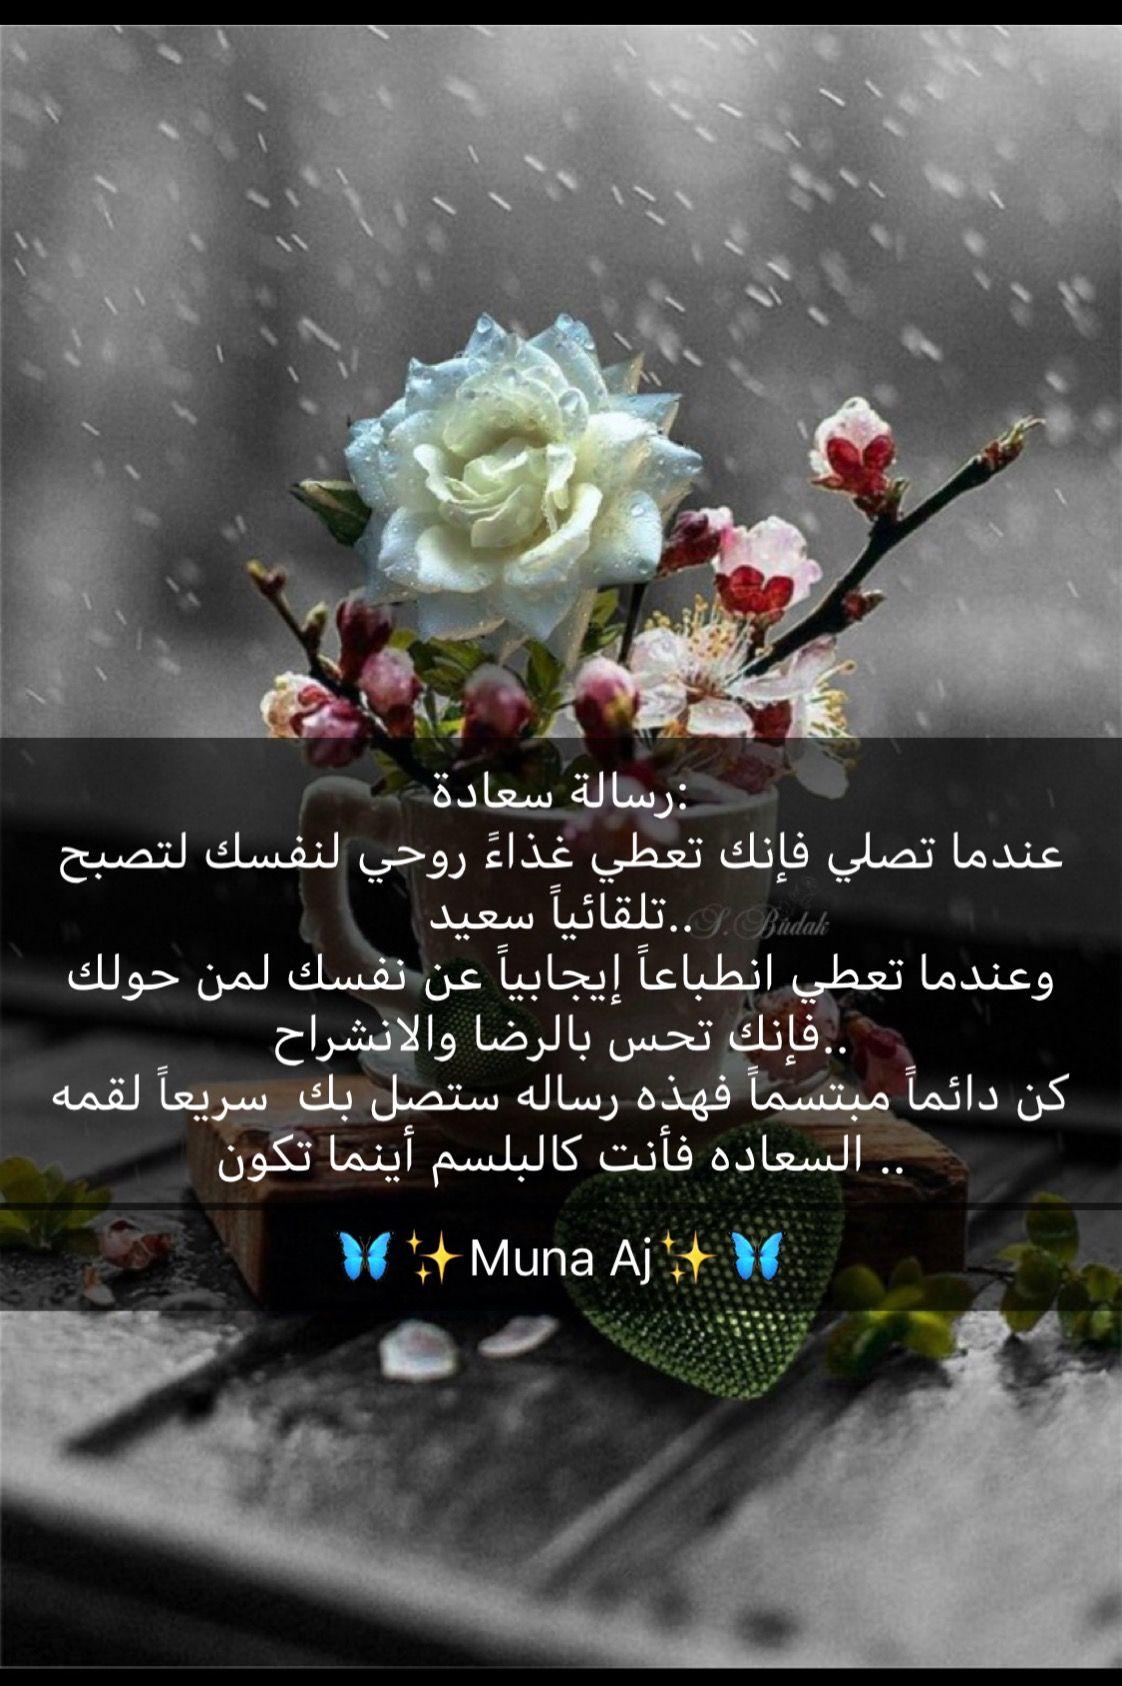 Pin By Queen Roses On صباح ومساء الخير اقتباسات جميله Islamic Pictures Prayers Greetings